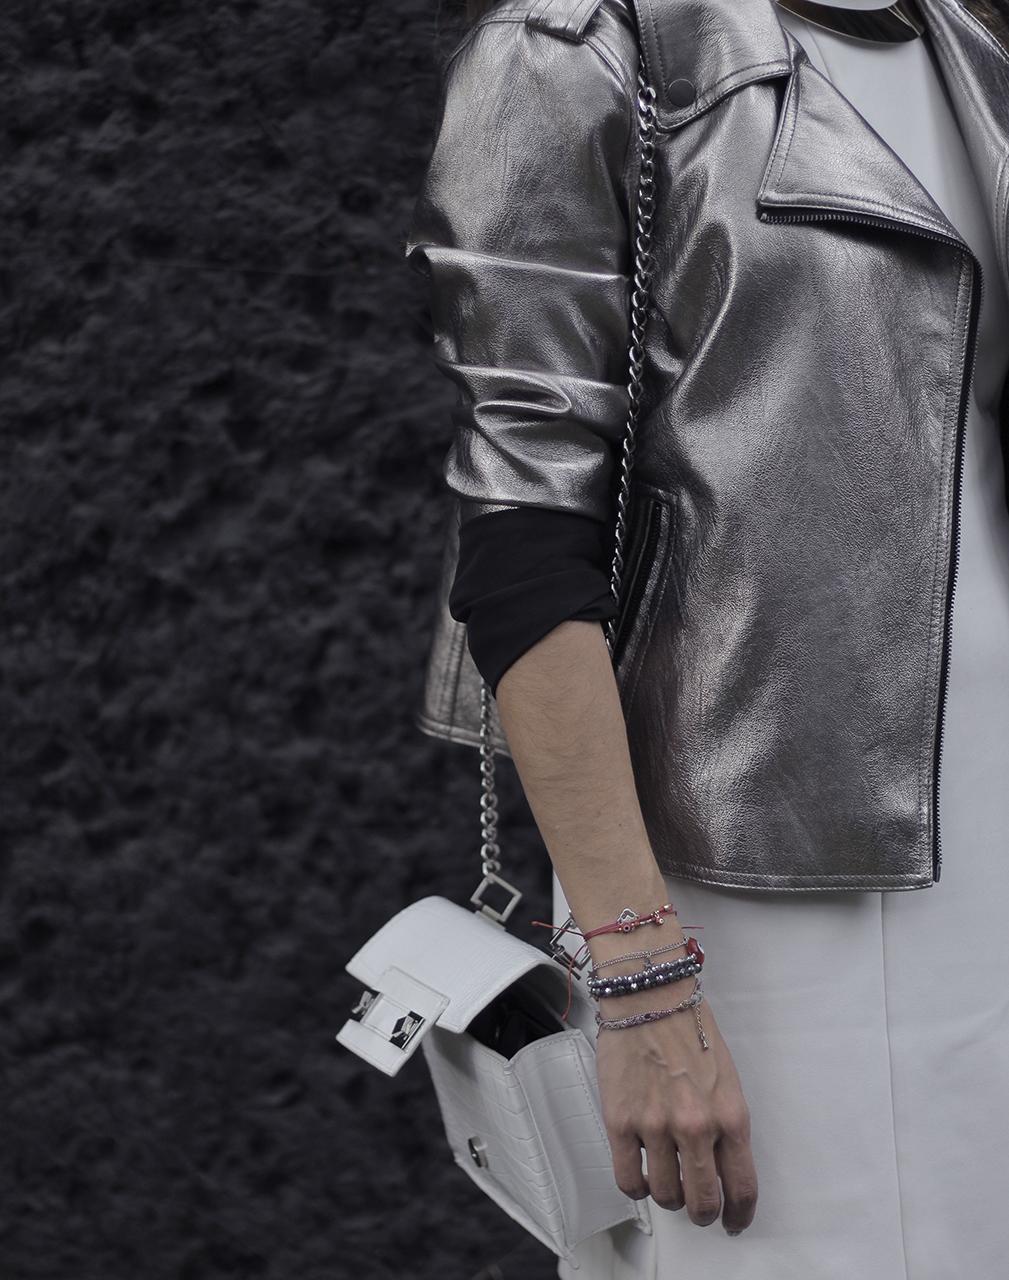 Silver trend